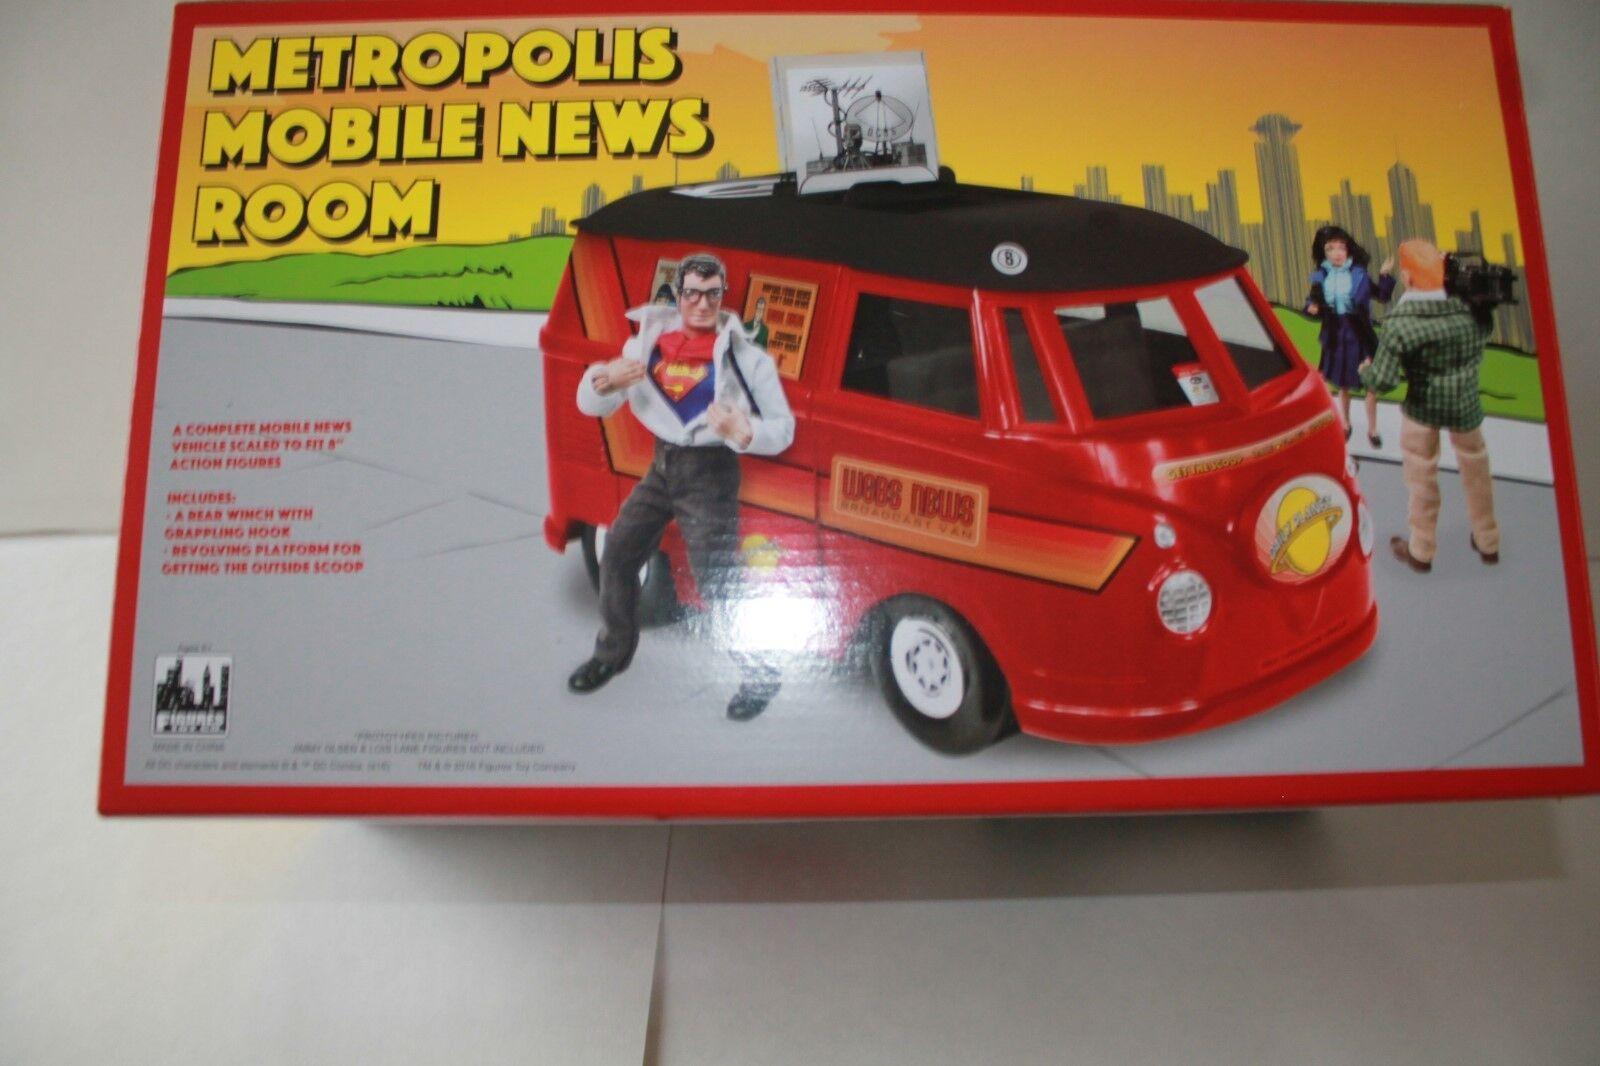 Metropolis Mobile News Room bus